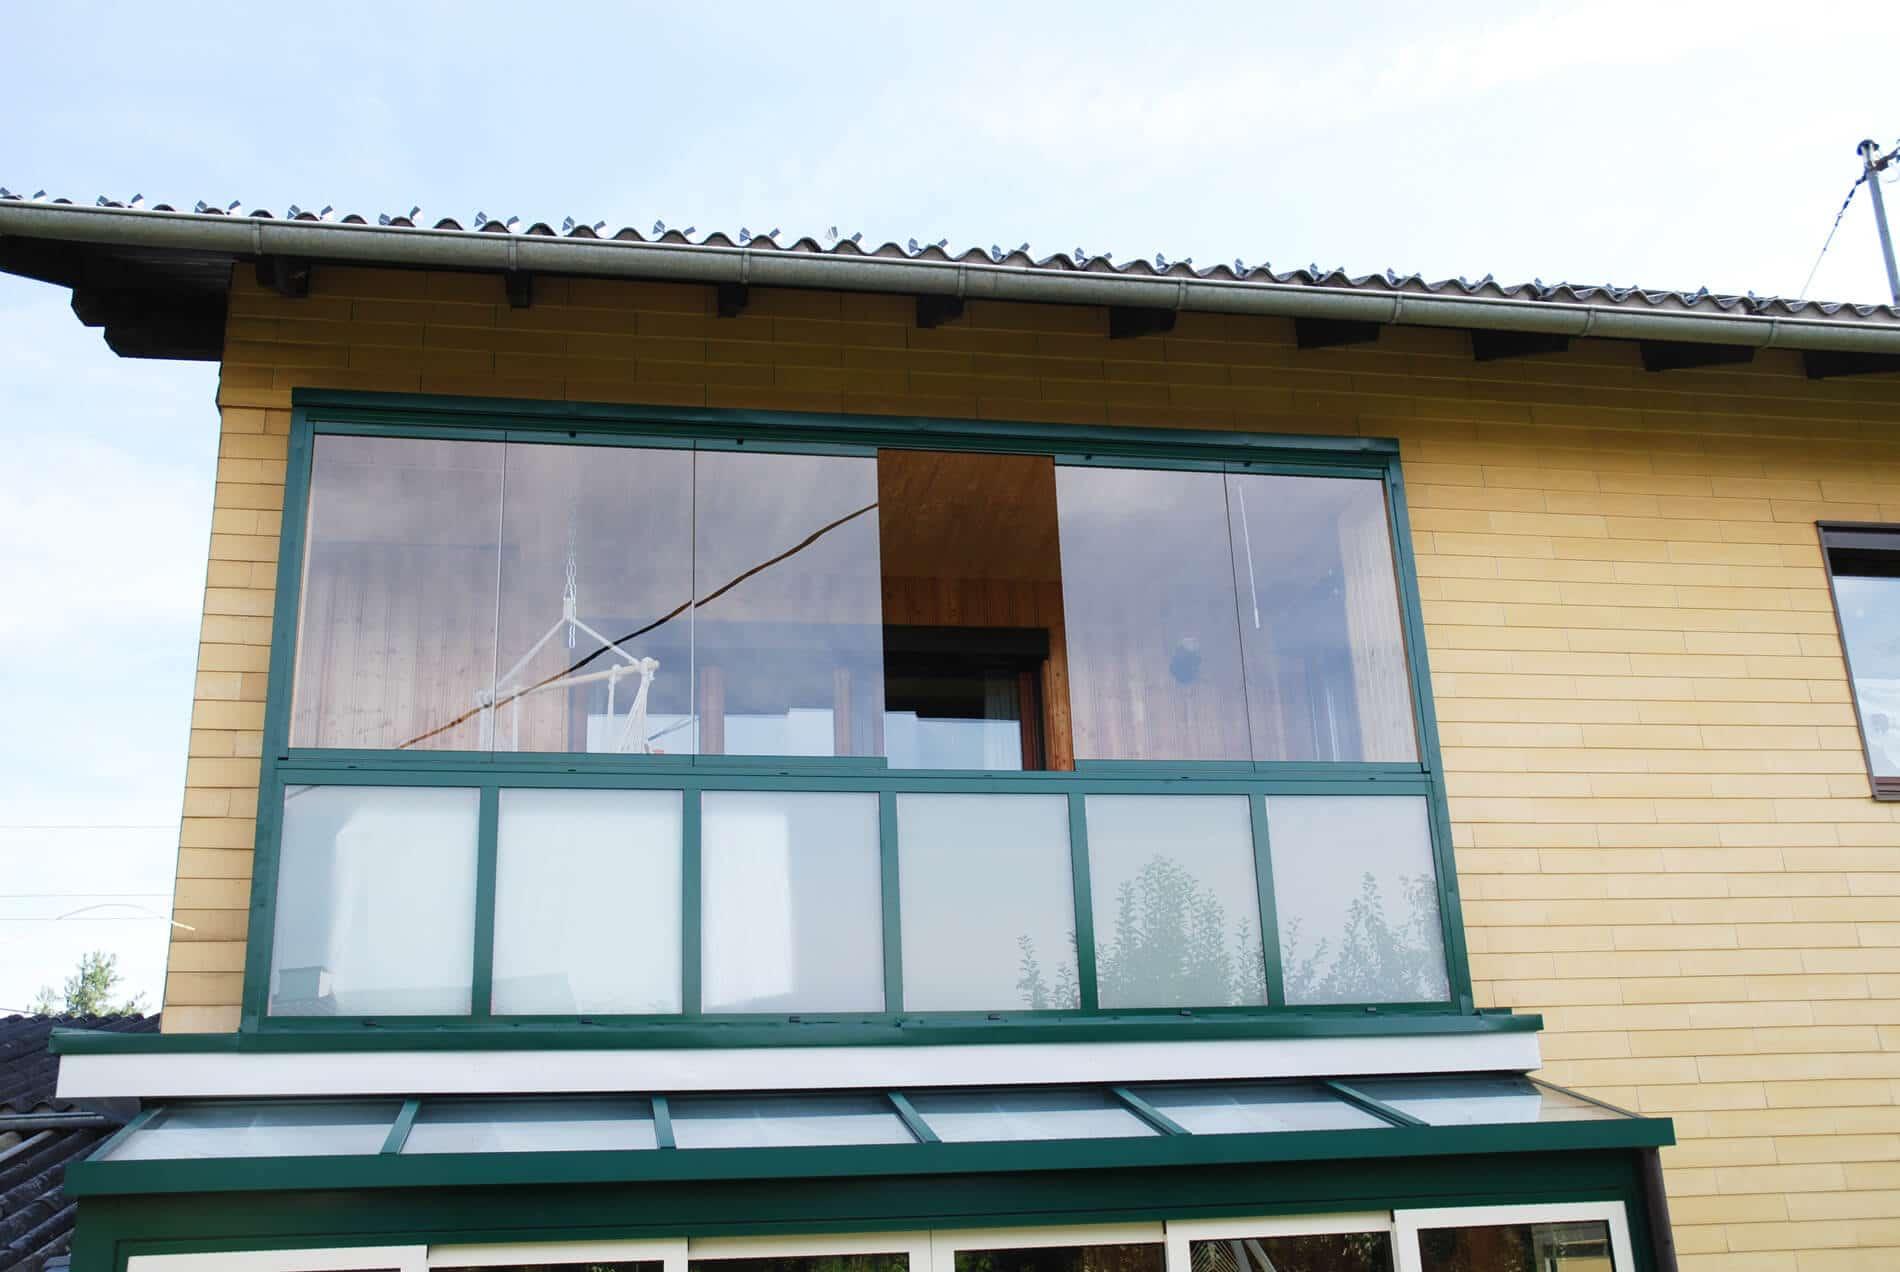 Balkonverglasung Schiebe-Dreh-System